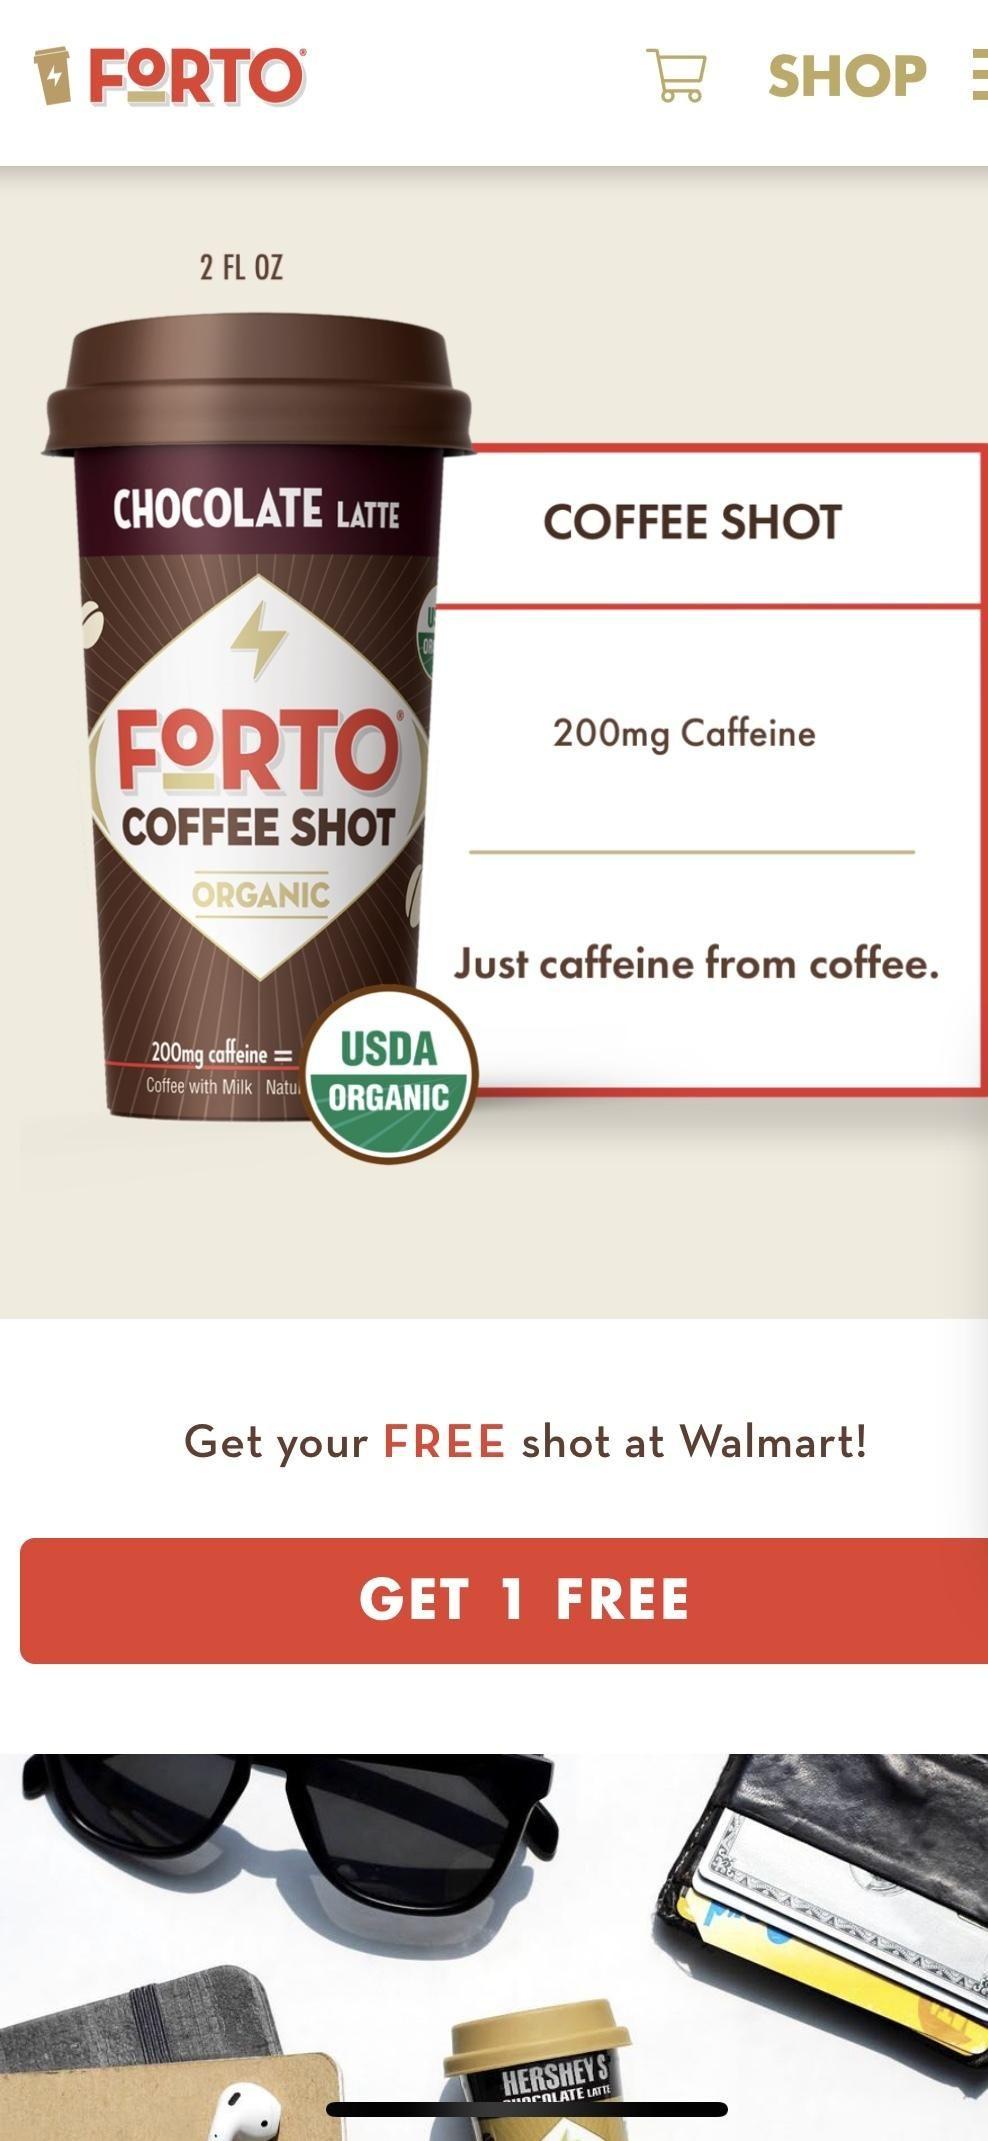 Free FORTO Coffee shot at Walmart via iBotta app